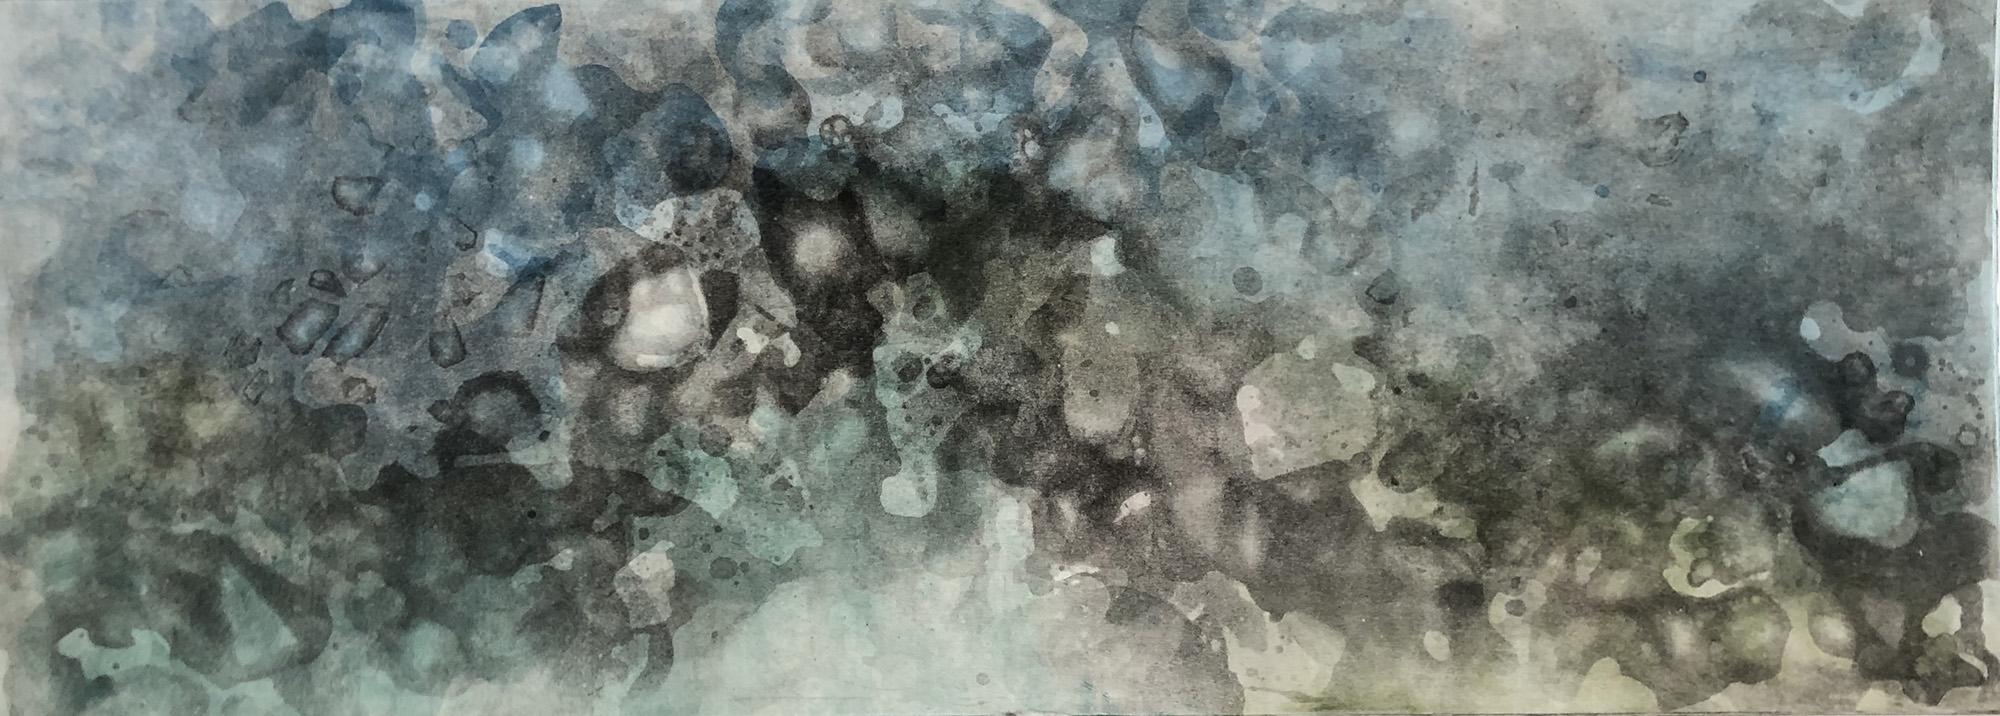 65 points - Broughton_Megan_Recherchebreen Glacial Lagoon 1 (2 plate, multicolor)